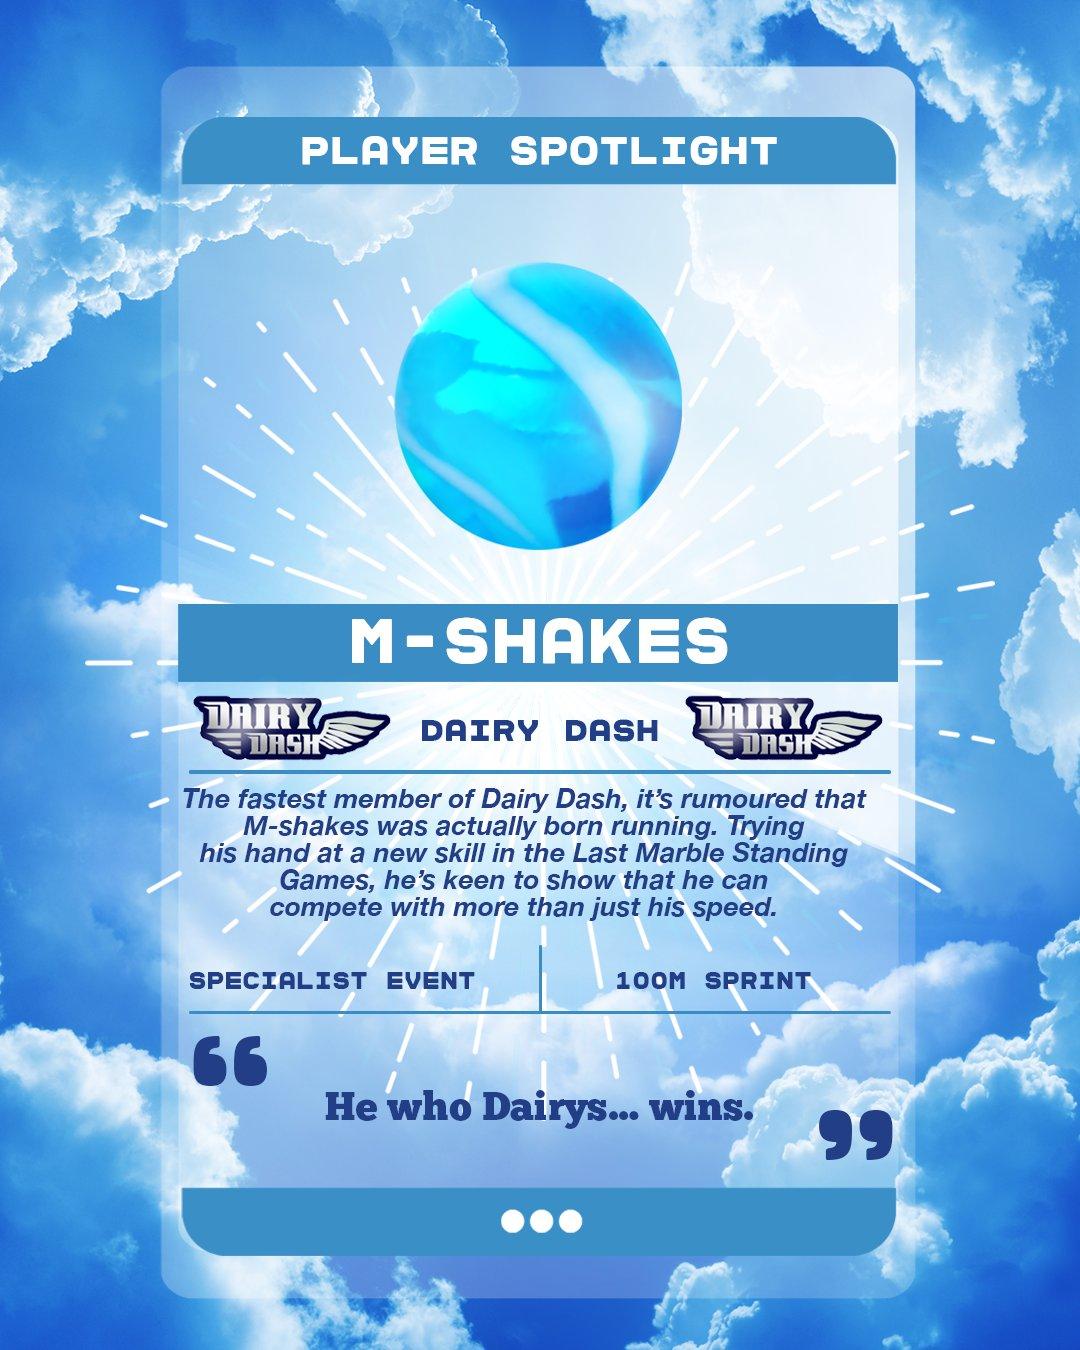 M-Shakes